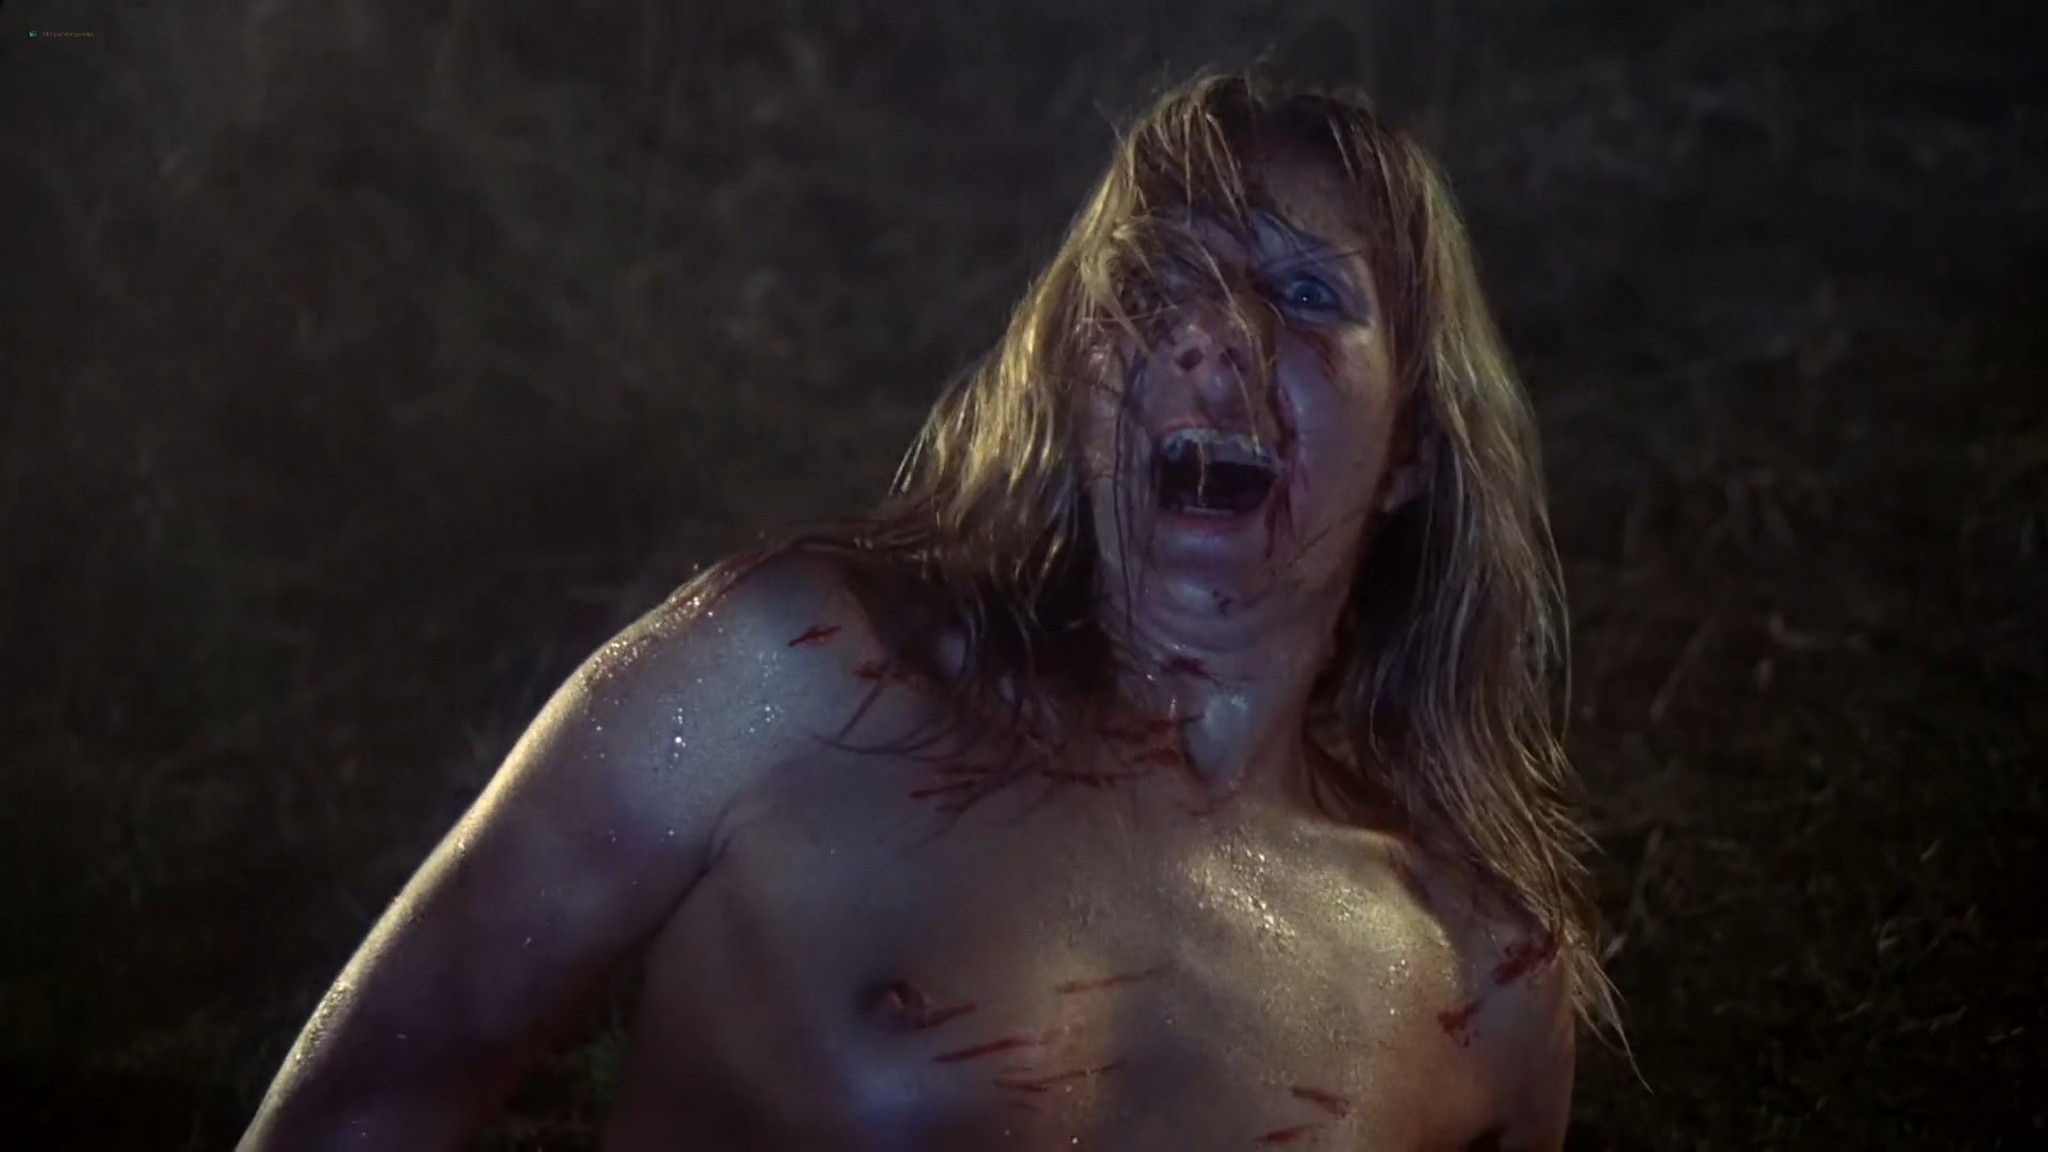 Carole Kirkham nude full frontal Silvia Miro Paquita Ondiviela all nude bush Panic Beats ES 1983 1080p BluRay 3